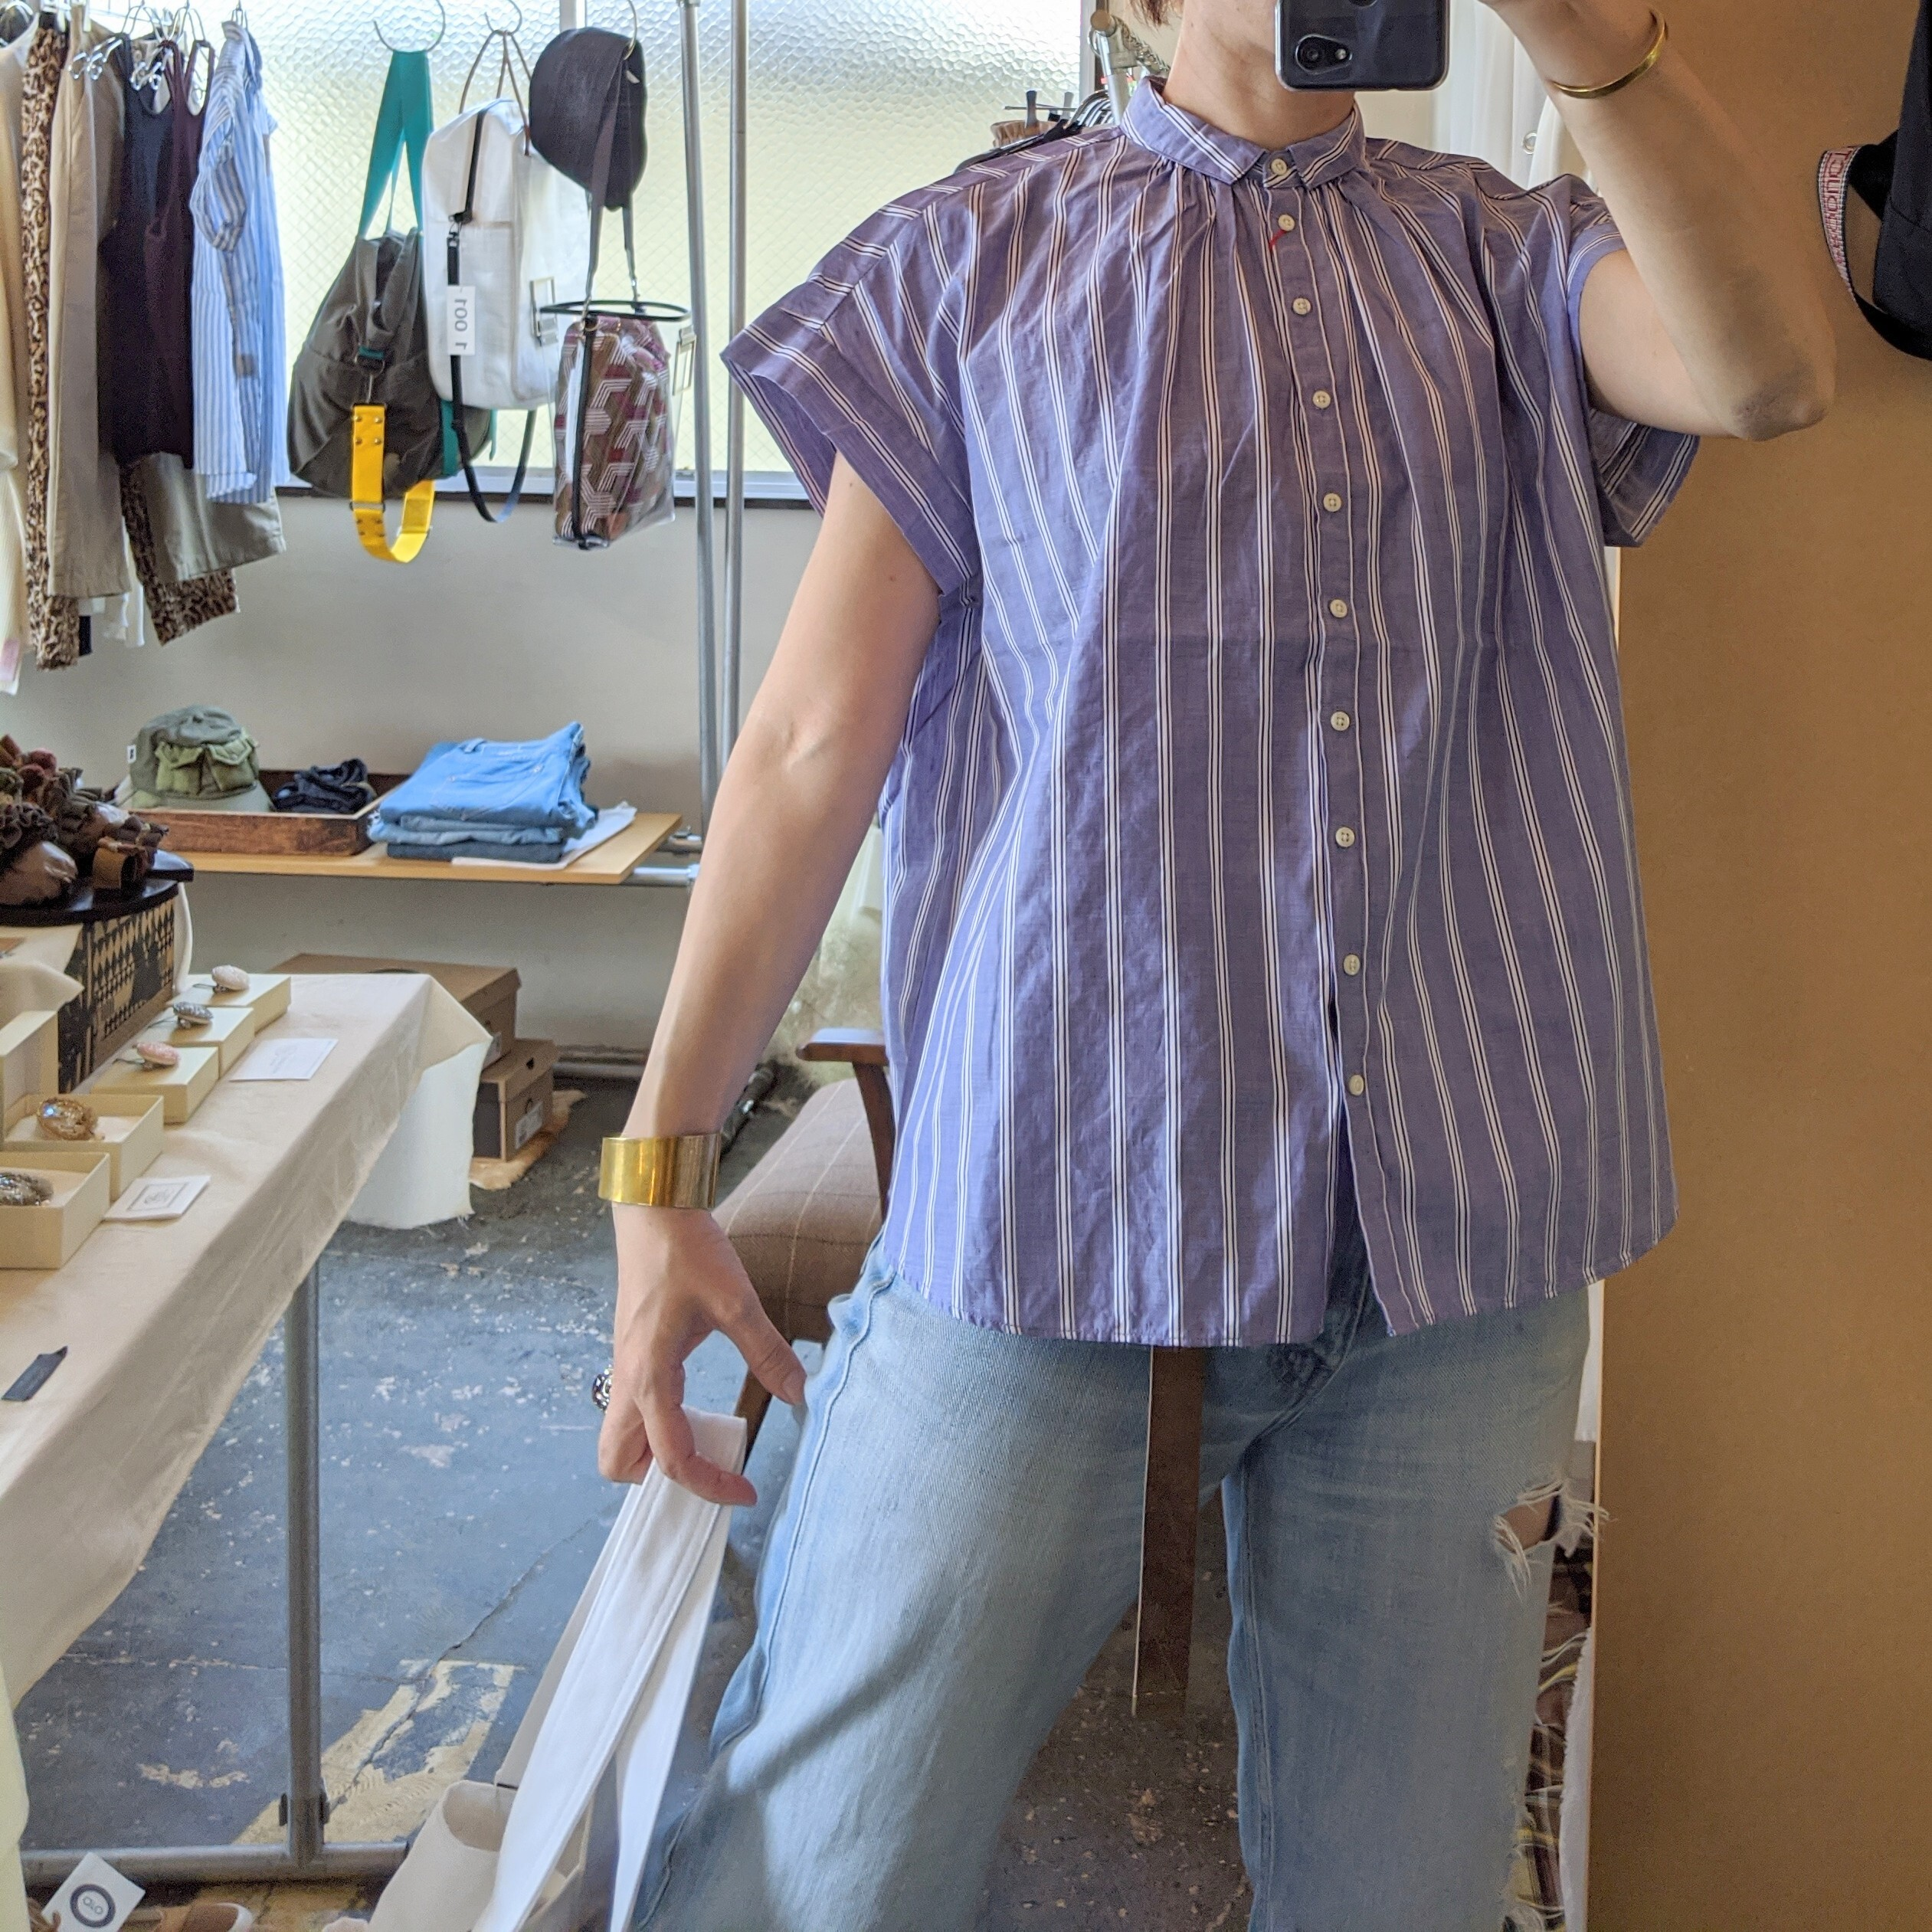 【  FANEUIL 】ファヌル ストライプギャザー半袖ブラウス/ stripe blouse blue×off white